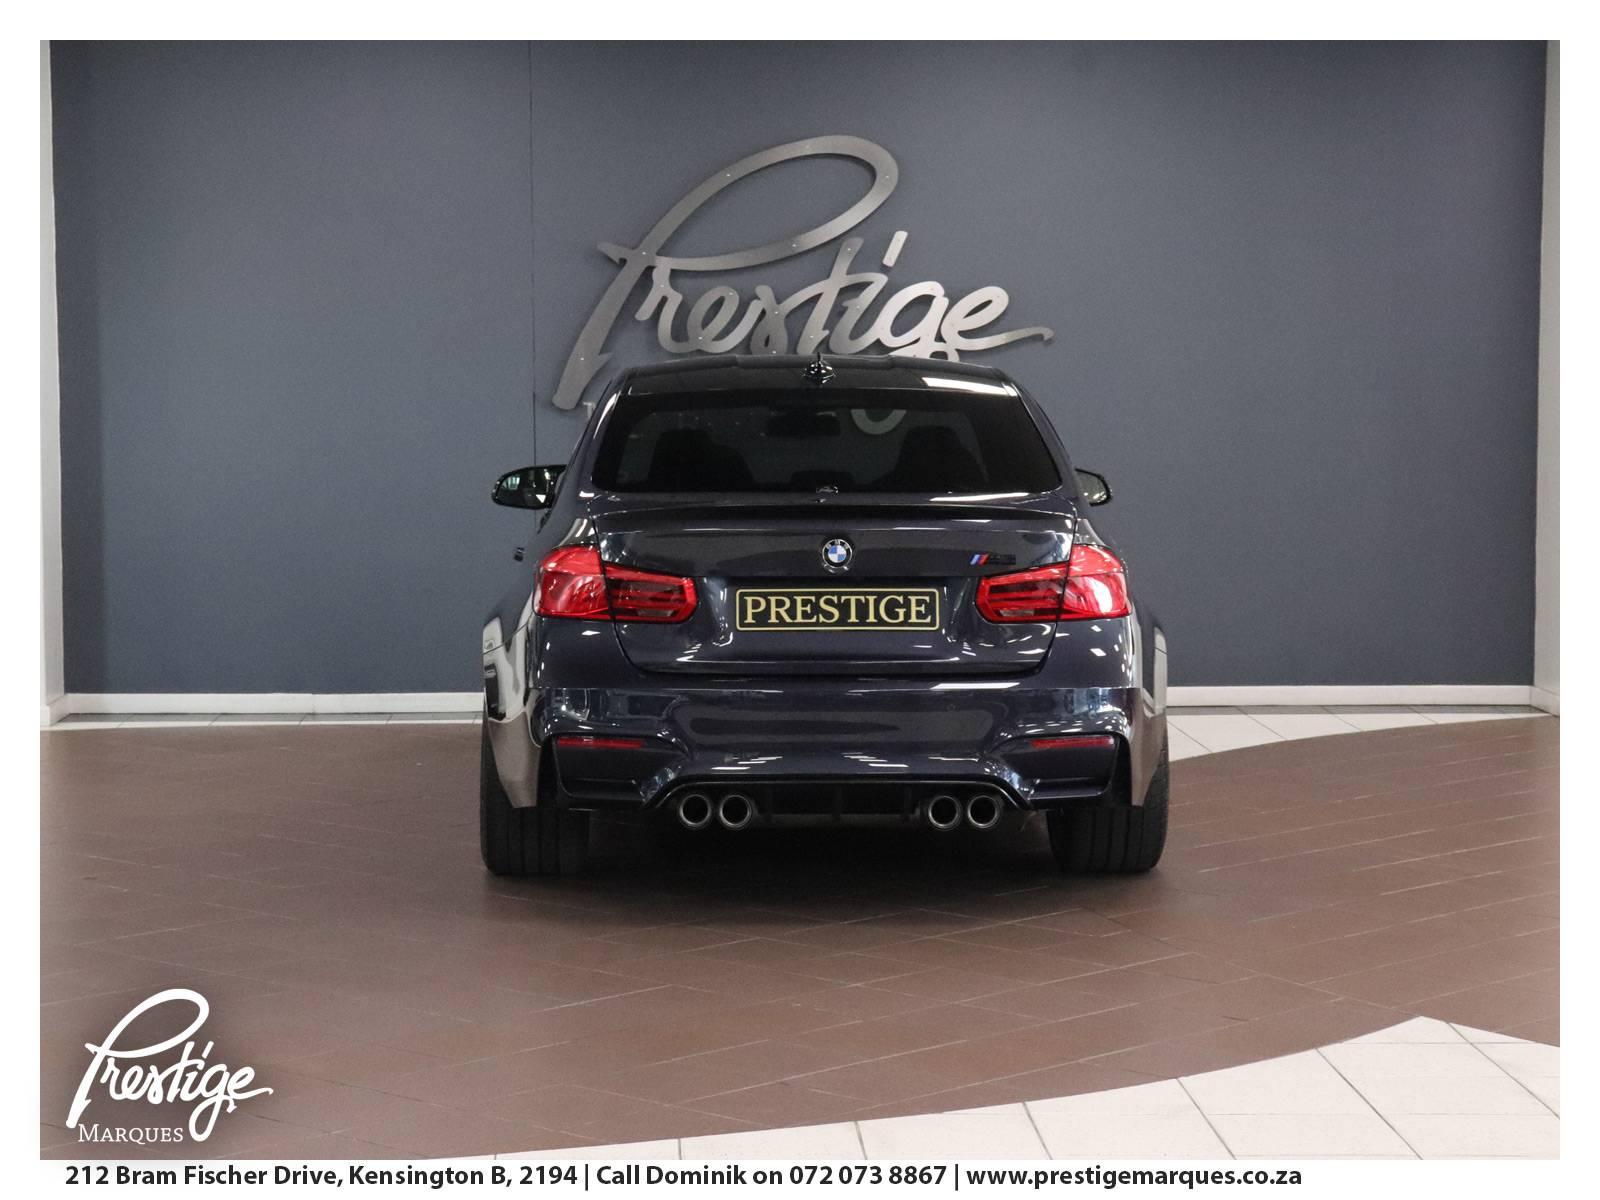 2016-BMW-M3-MDCT-30-Jarare-Prestige-Marques-Randburg-Sandton-4